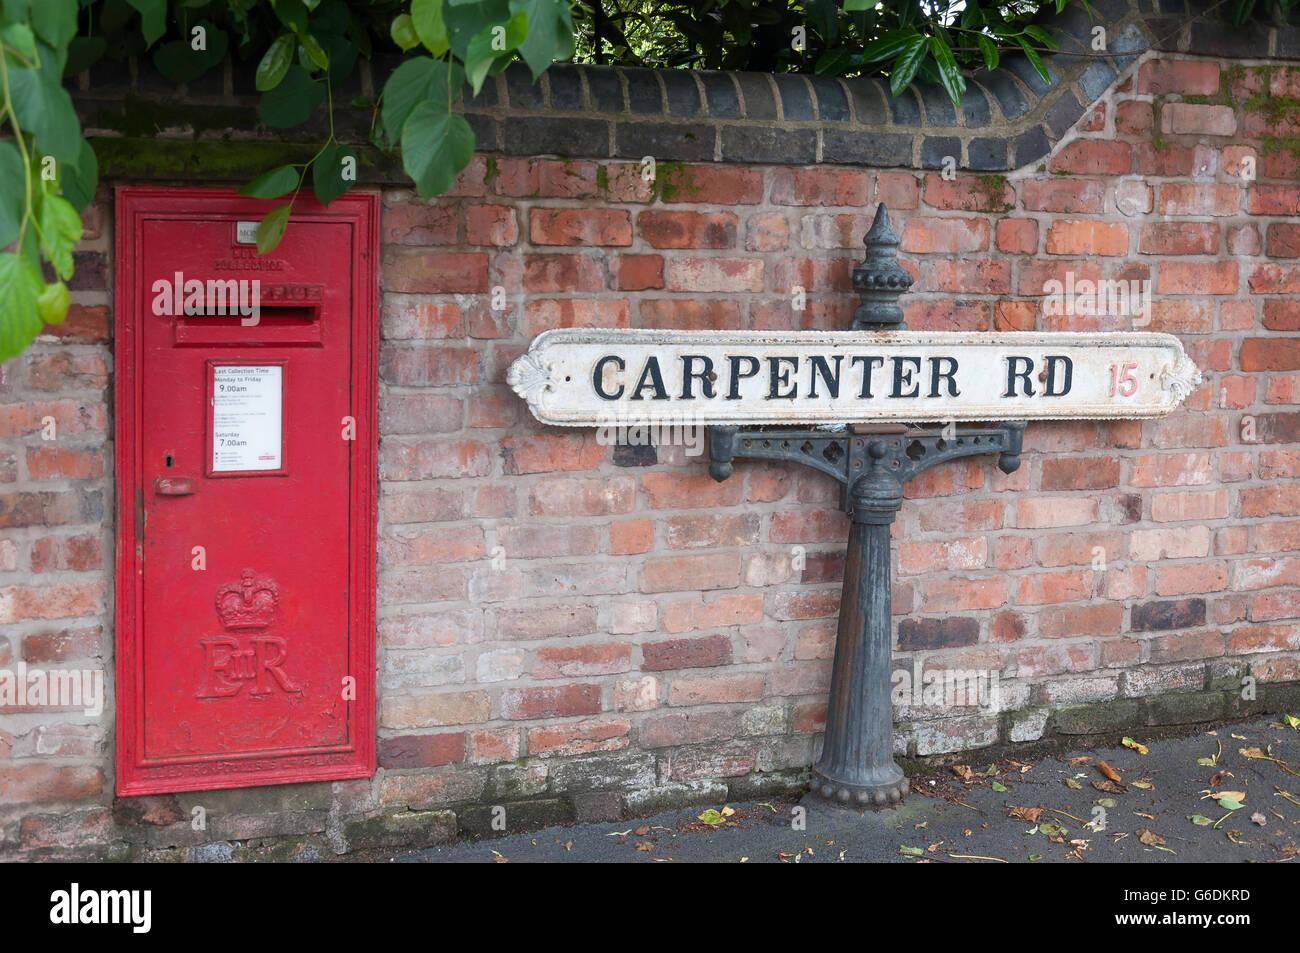 Period road sign and post box, Carpenter Road, Edgbaston, Birmingham, West Midlands, England, United Kingdom - Stock Image